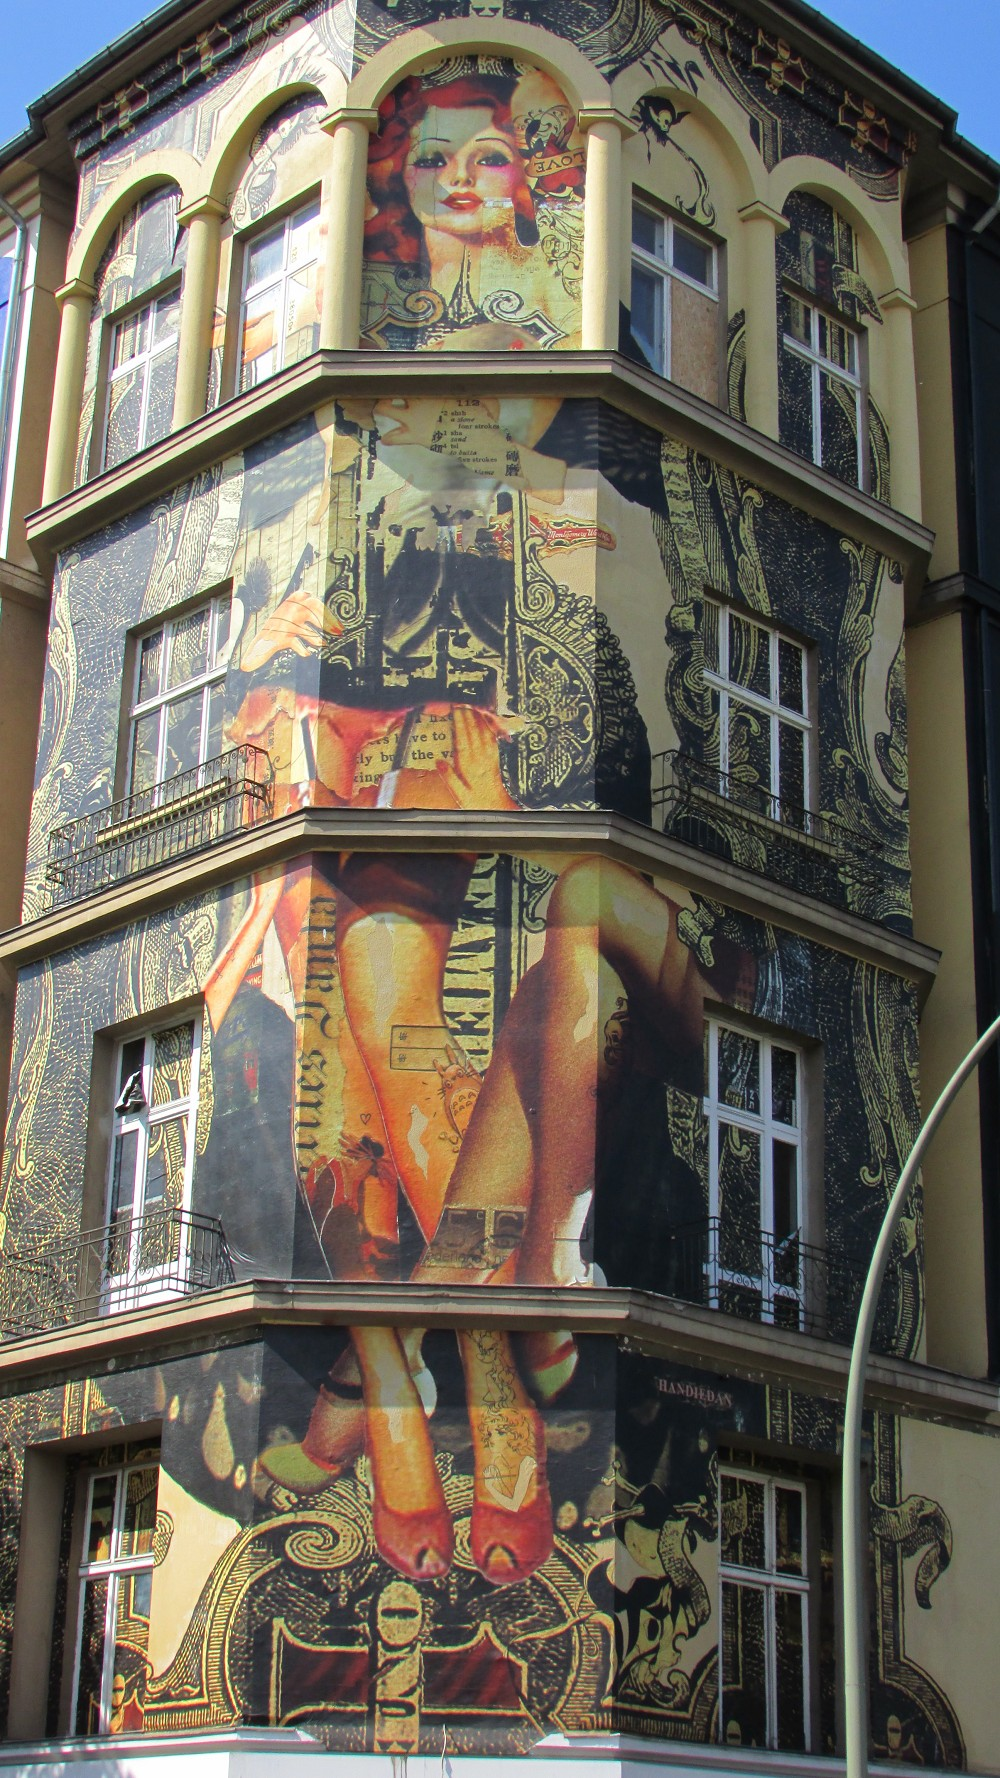 street-art-museum-berlin5